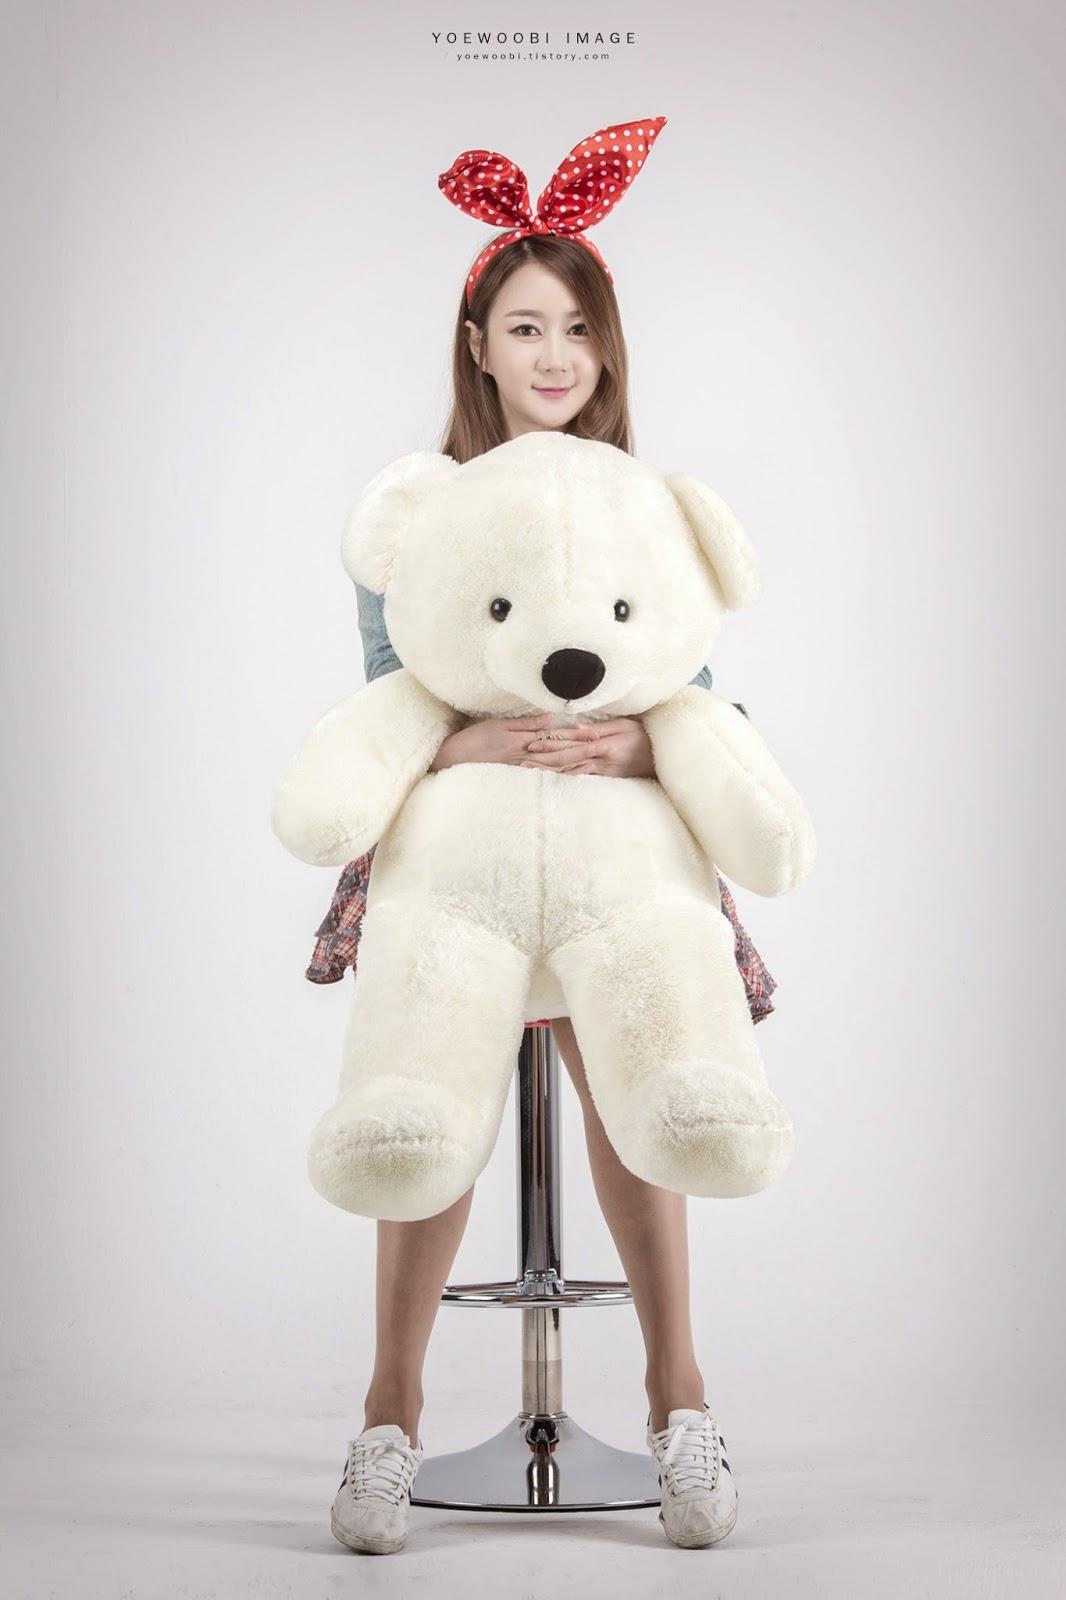 4 Han Chae Yee - IN-N-OUT - very cute asian girl-girlcute4u.blogspot.com